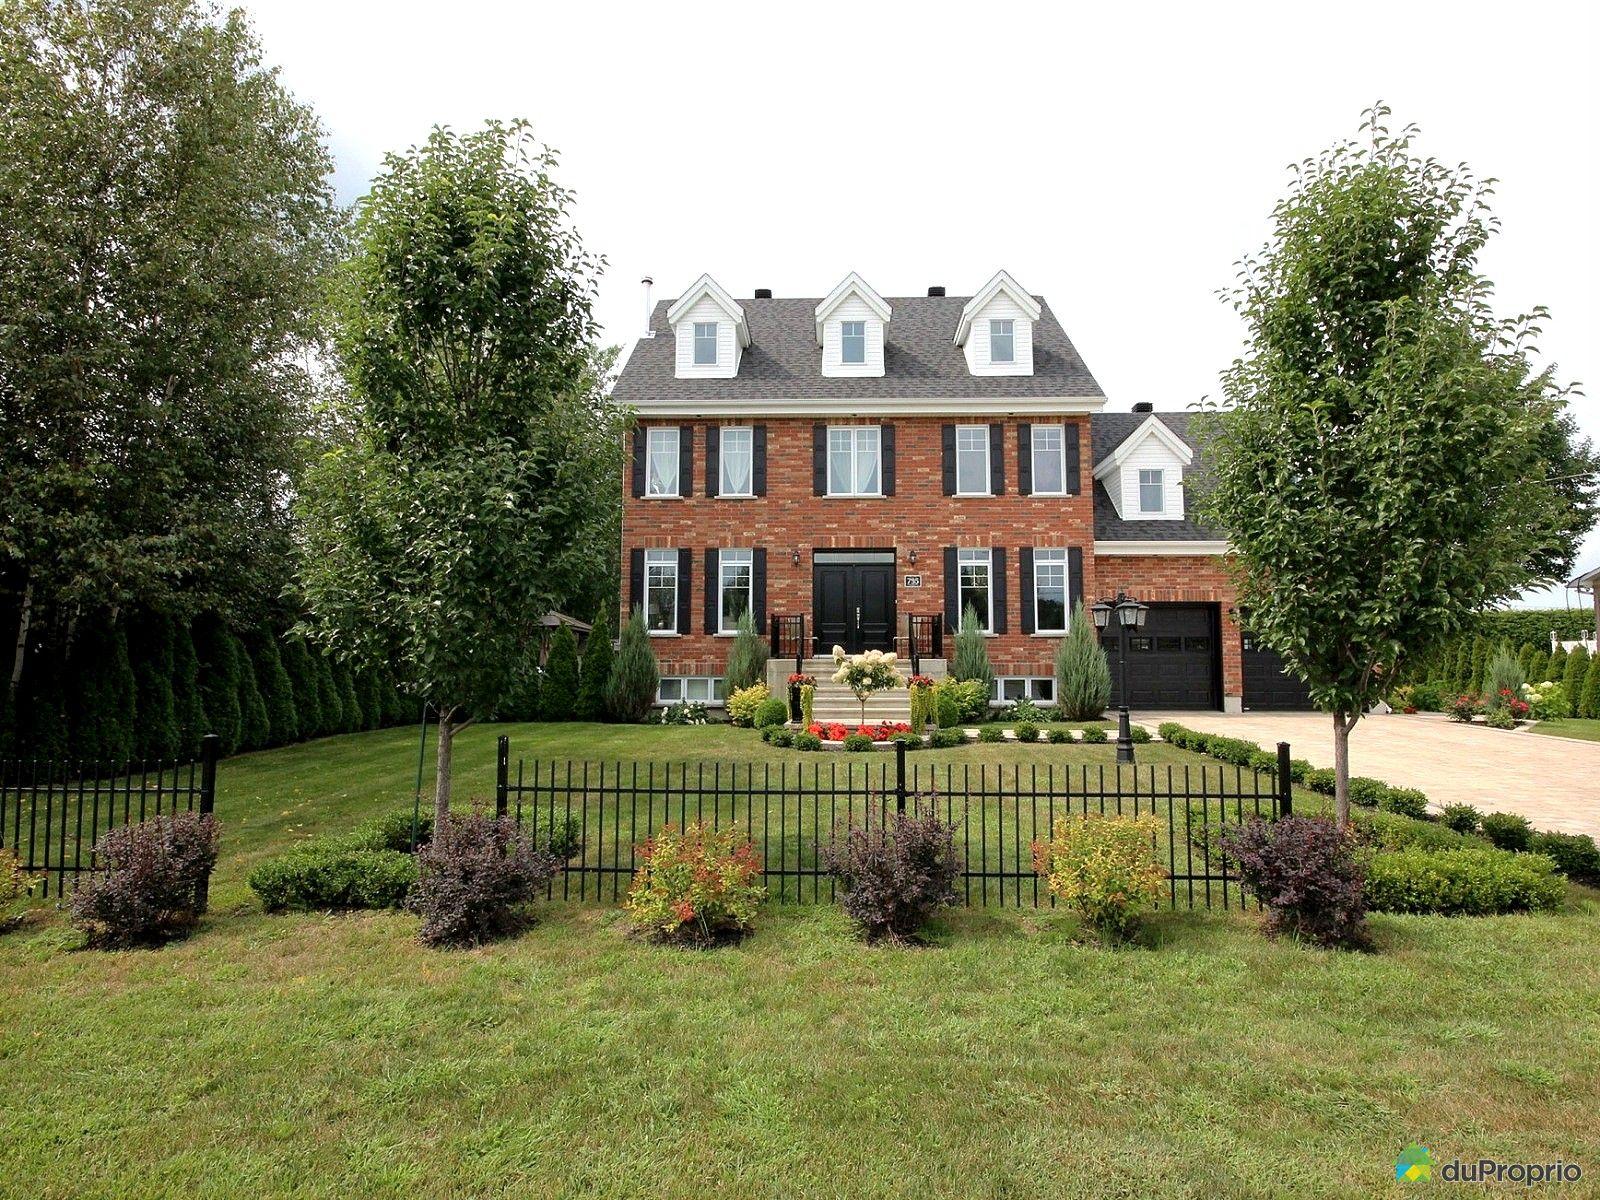 maison vendre st amable 795 rue martin immobilier qu bec duproprio 196783. Black Bedroom Furniture Sets. Home Design Ideas